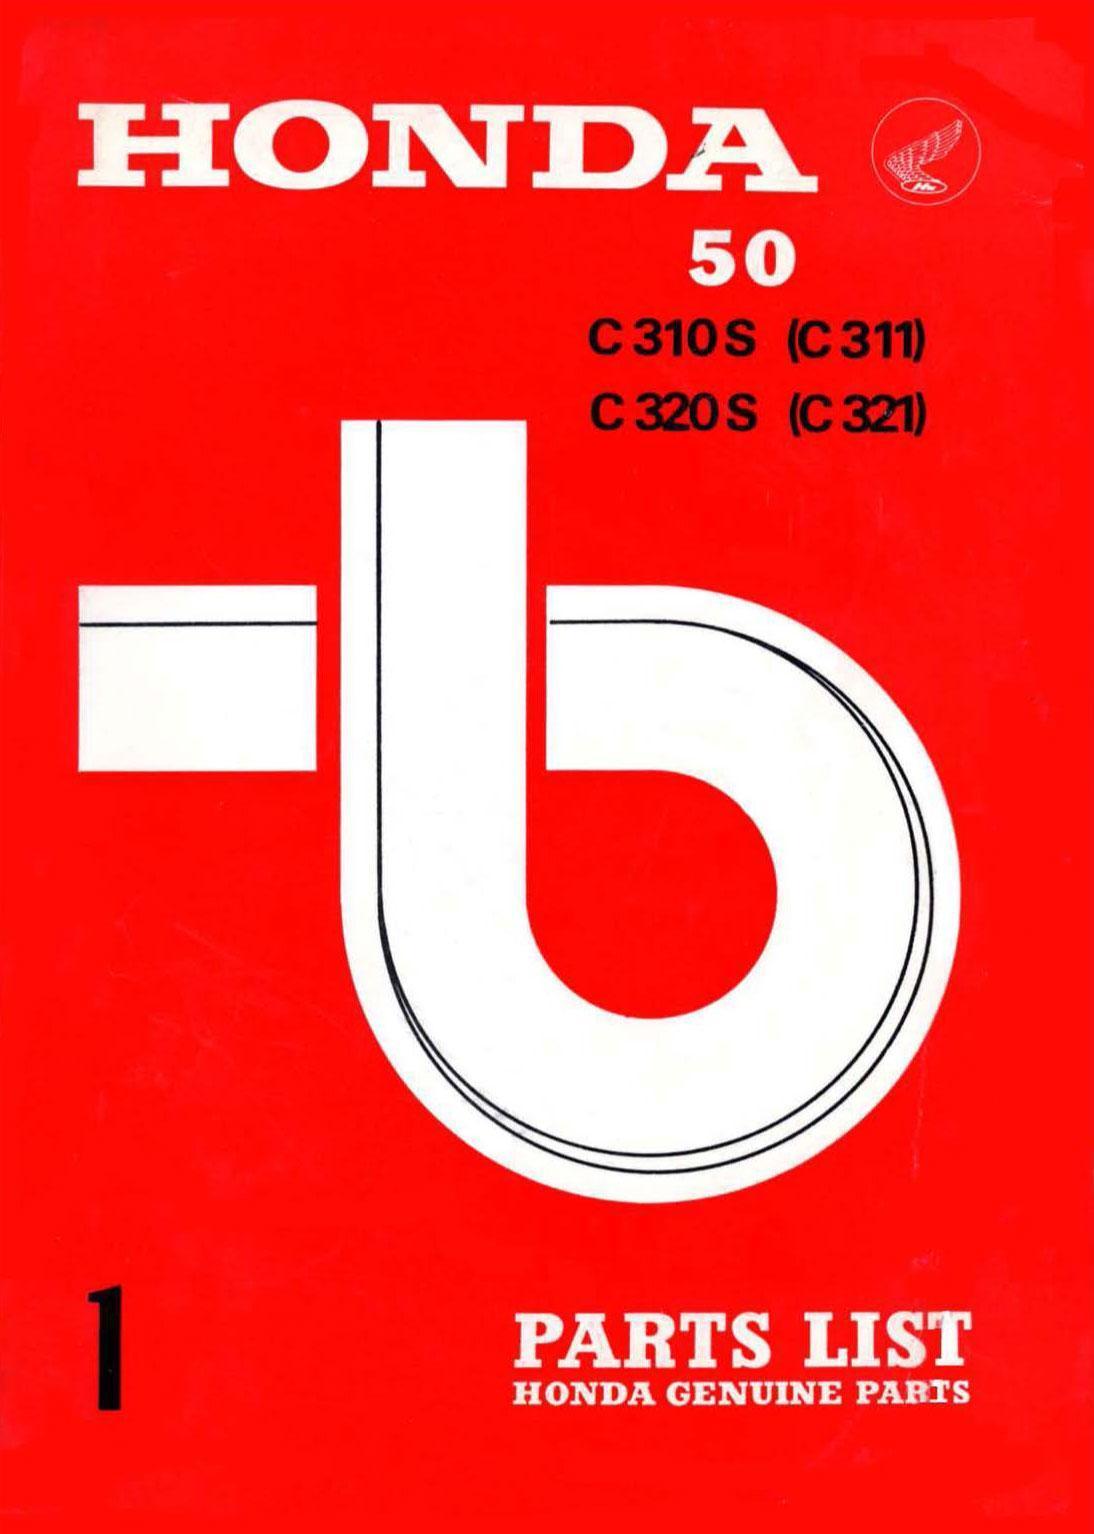 Parts List for Honda C321 (1967)